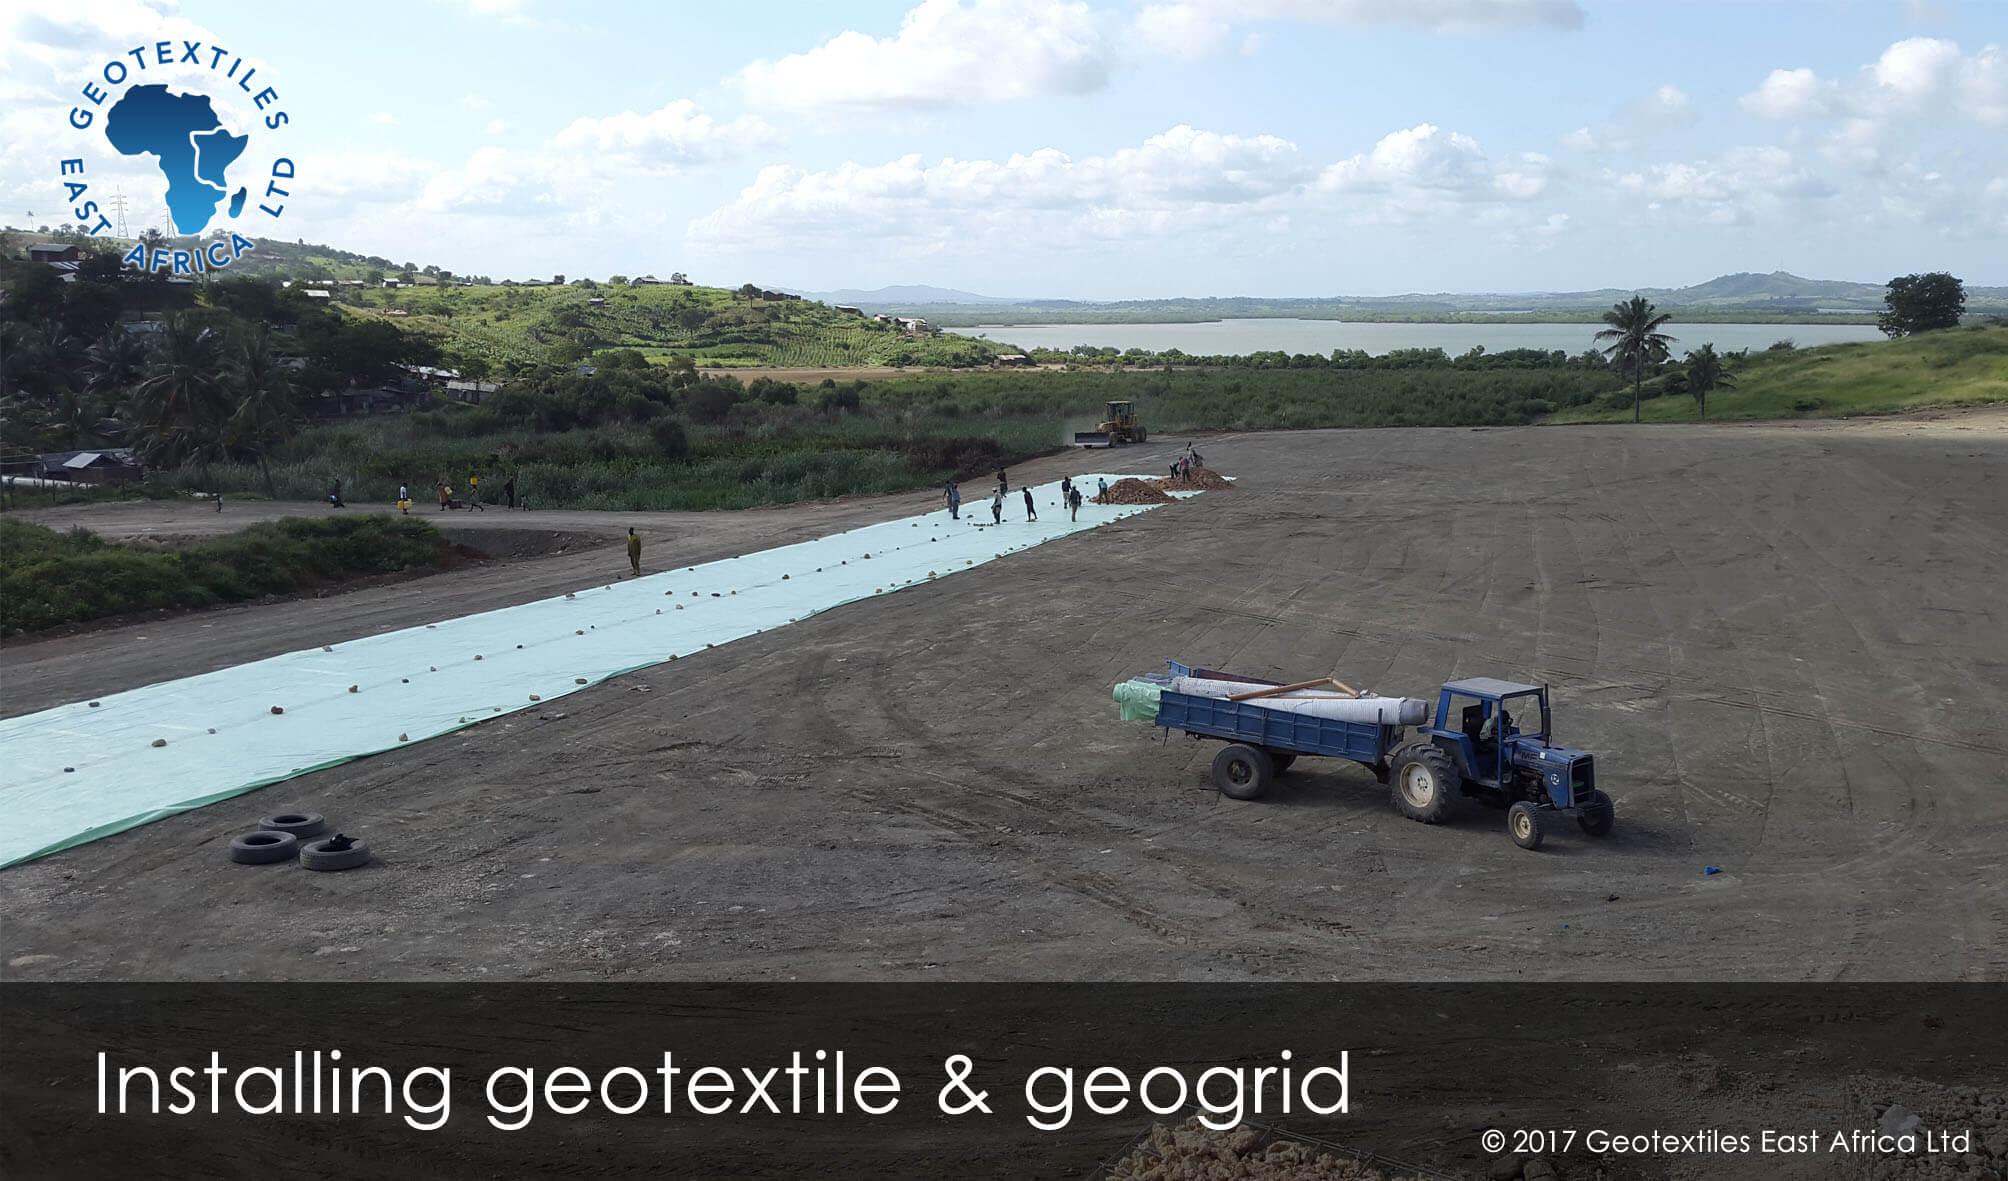 geotextile for soil separation